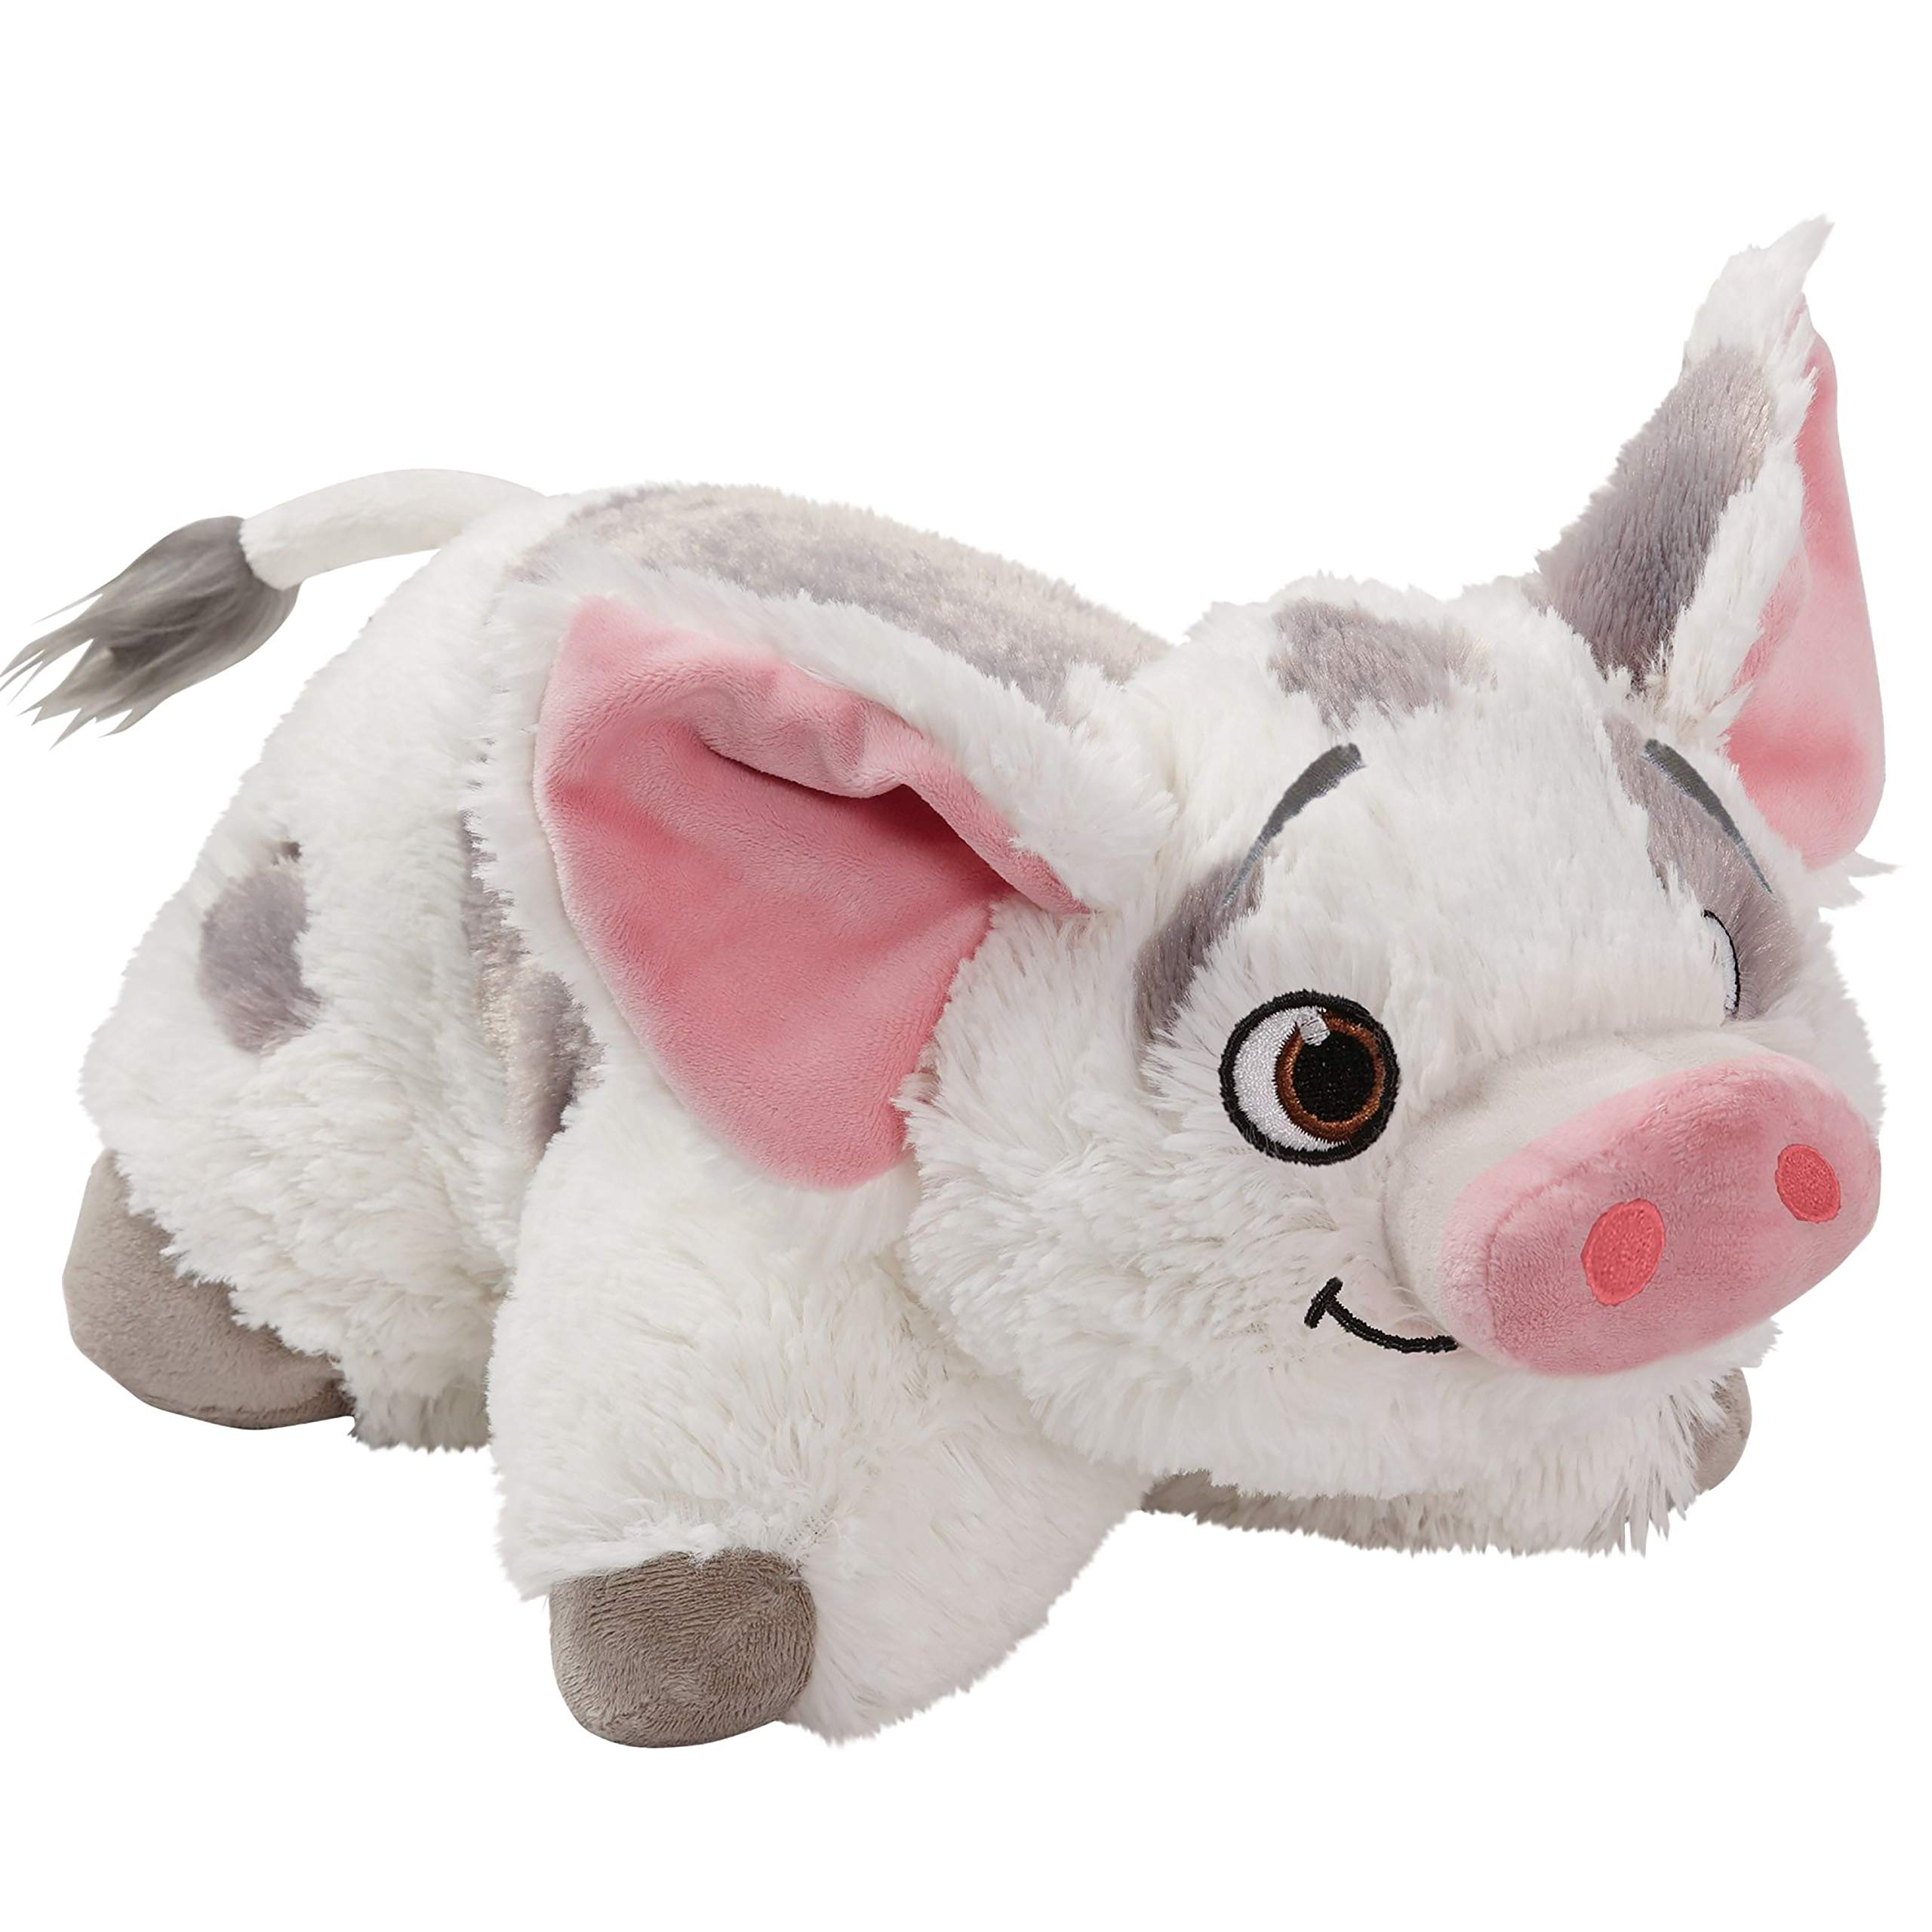 Pillow Pets Disney Moana Stuffed Animal Plush Pillow Pet 16'', Pua by Pillow Pets